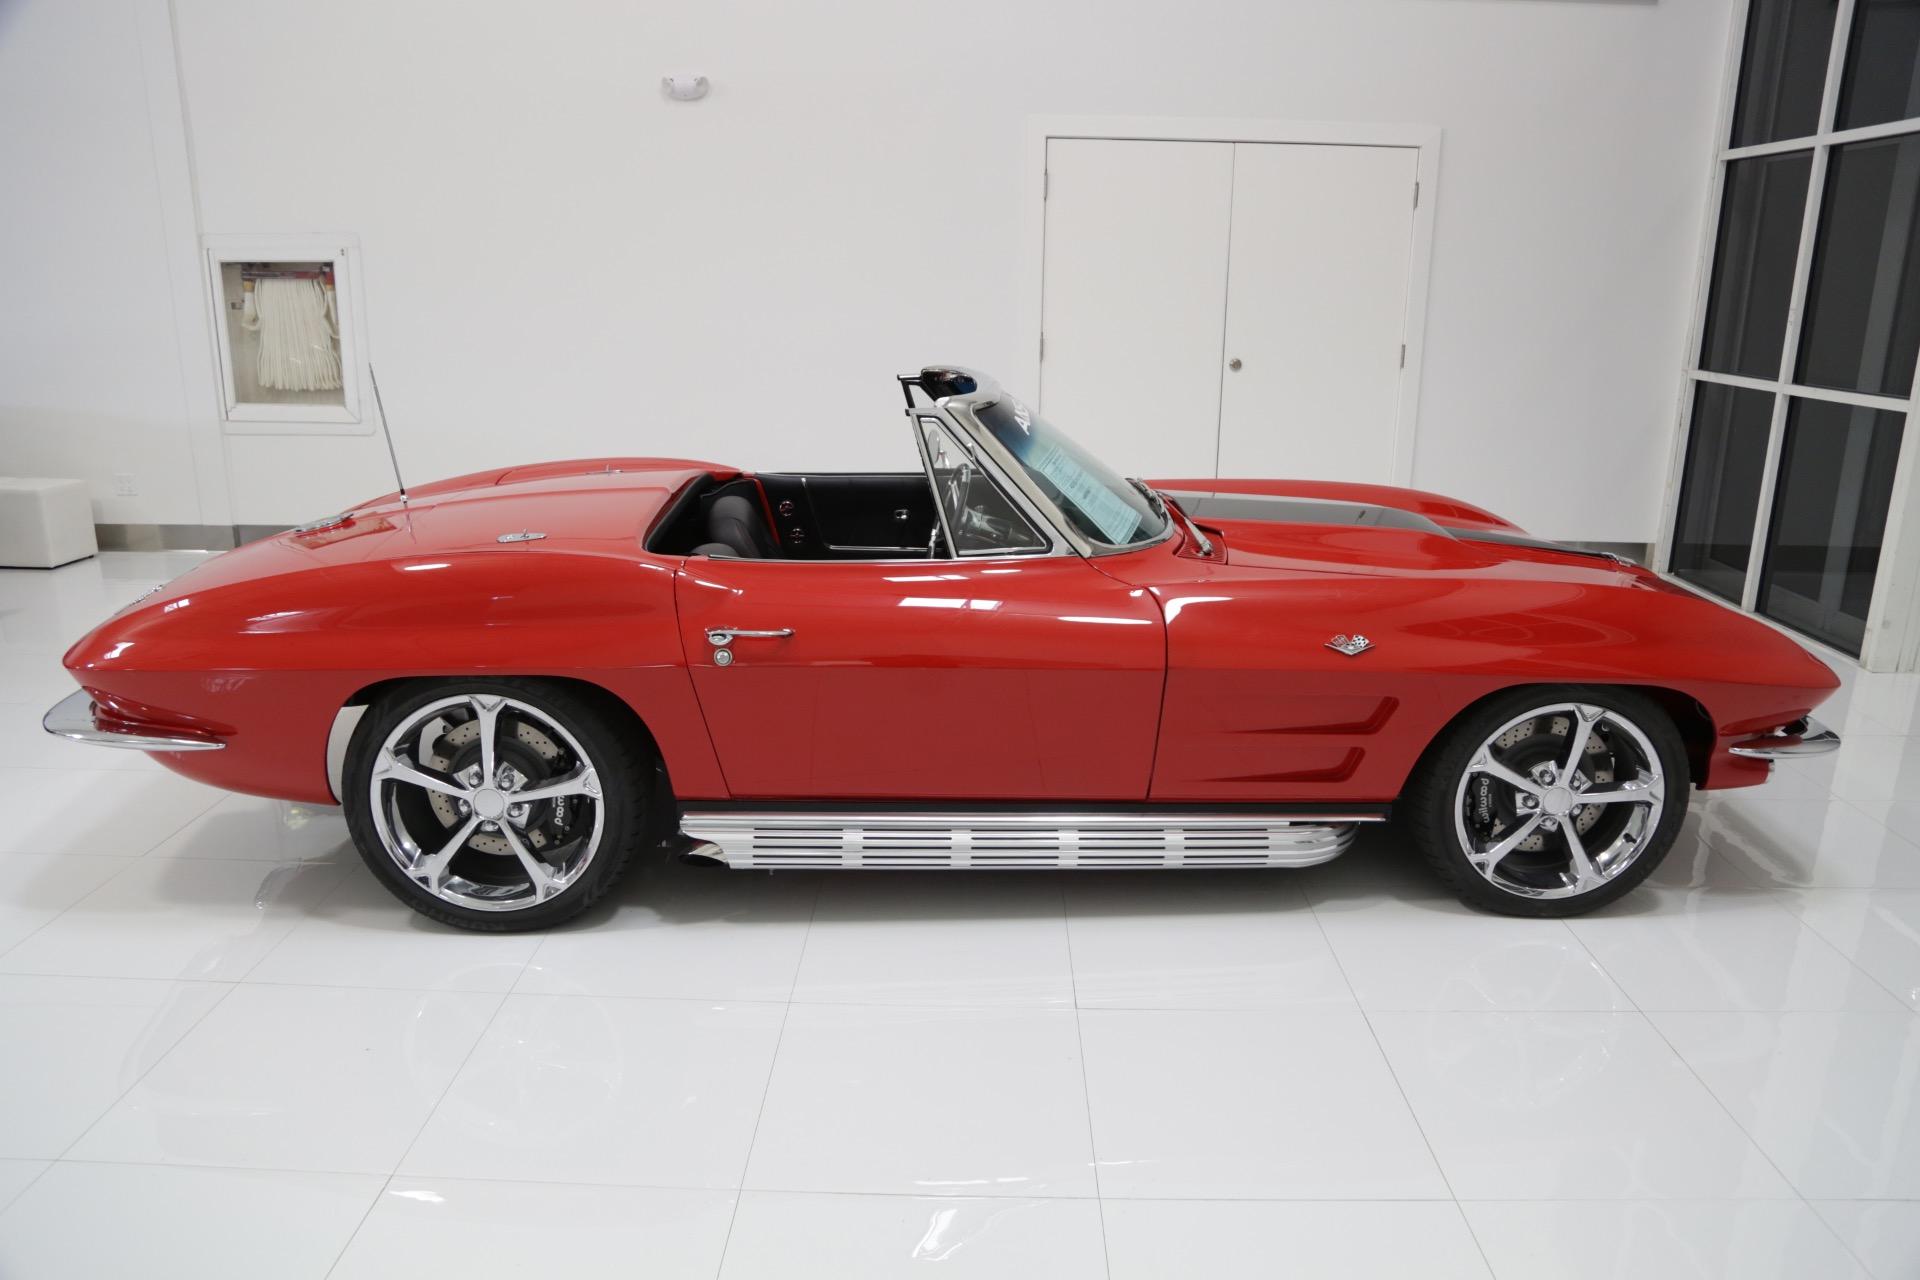 1964 Chevrolet Corvette Stingray For Sale in Miami FL